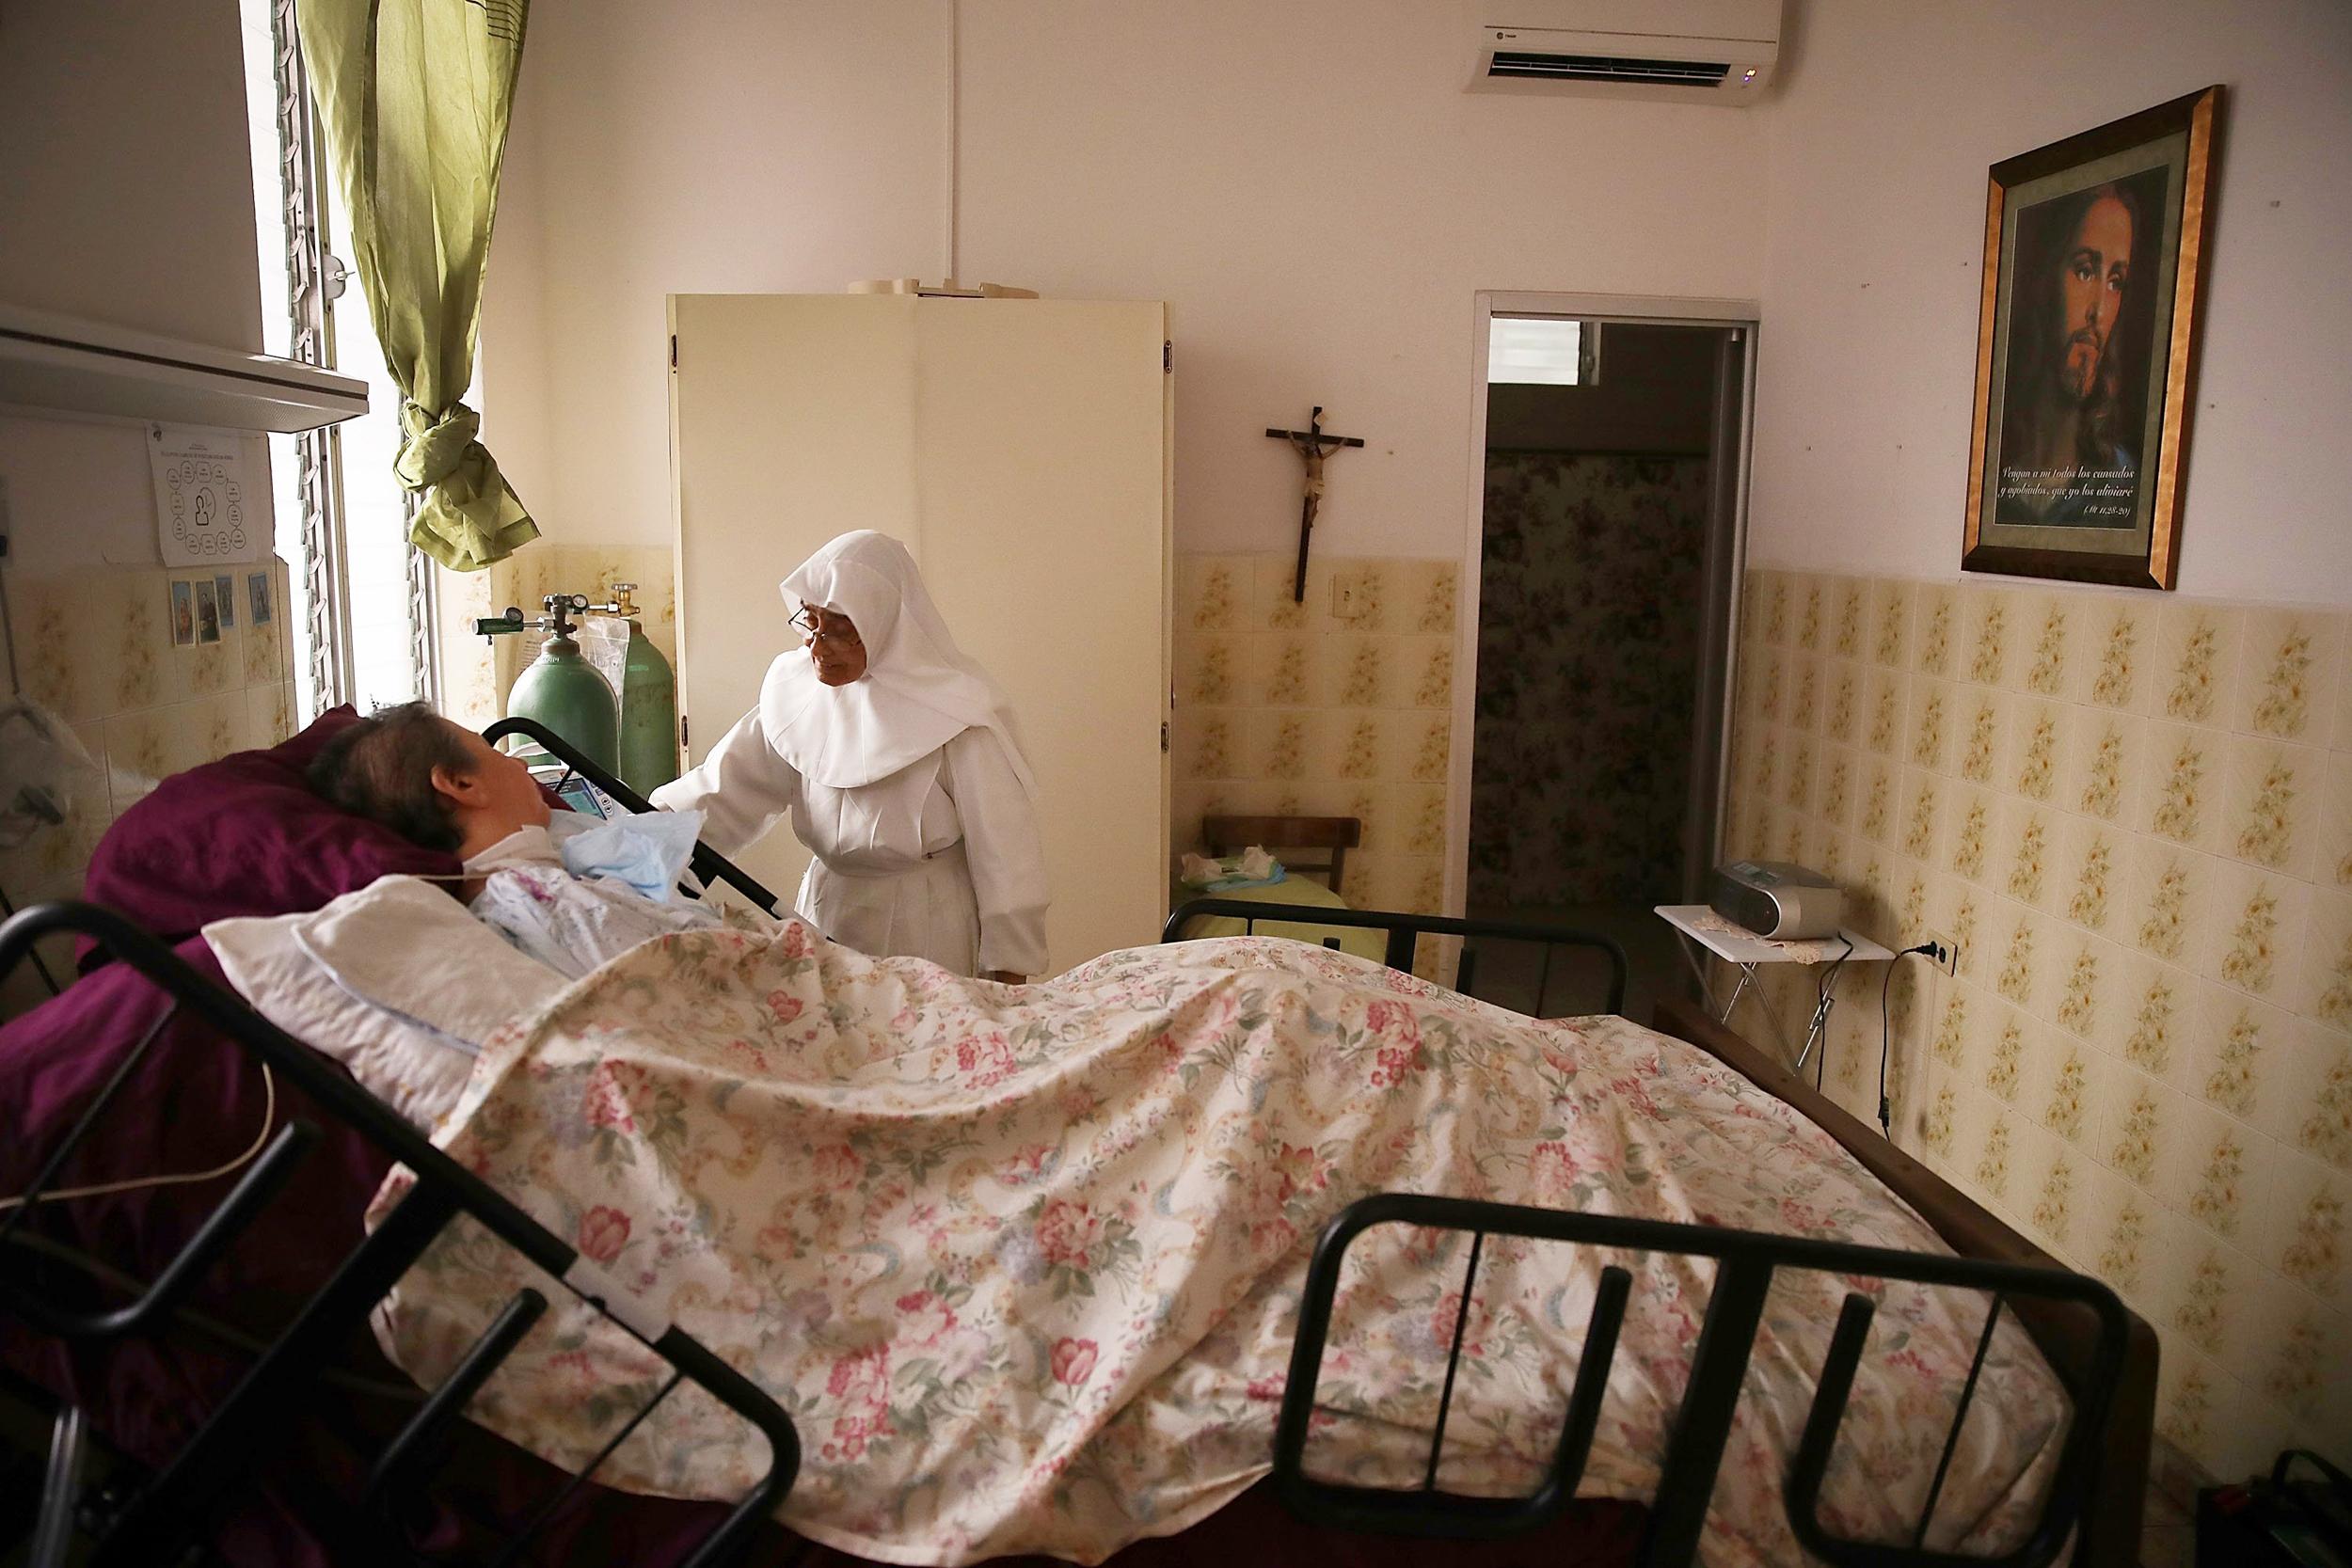 Image: Sister Gloria Flores checks in on a  patient at the Hermanitas de los Ancianos Desamparados facility which cares for the elderly